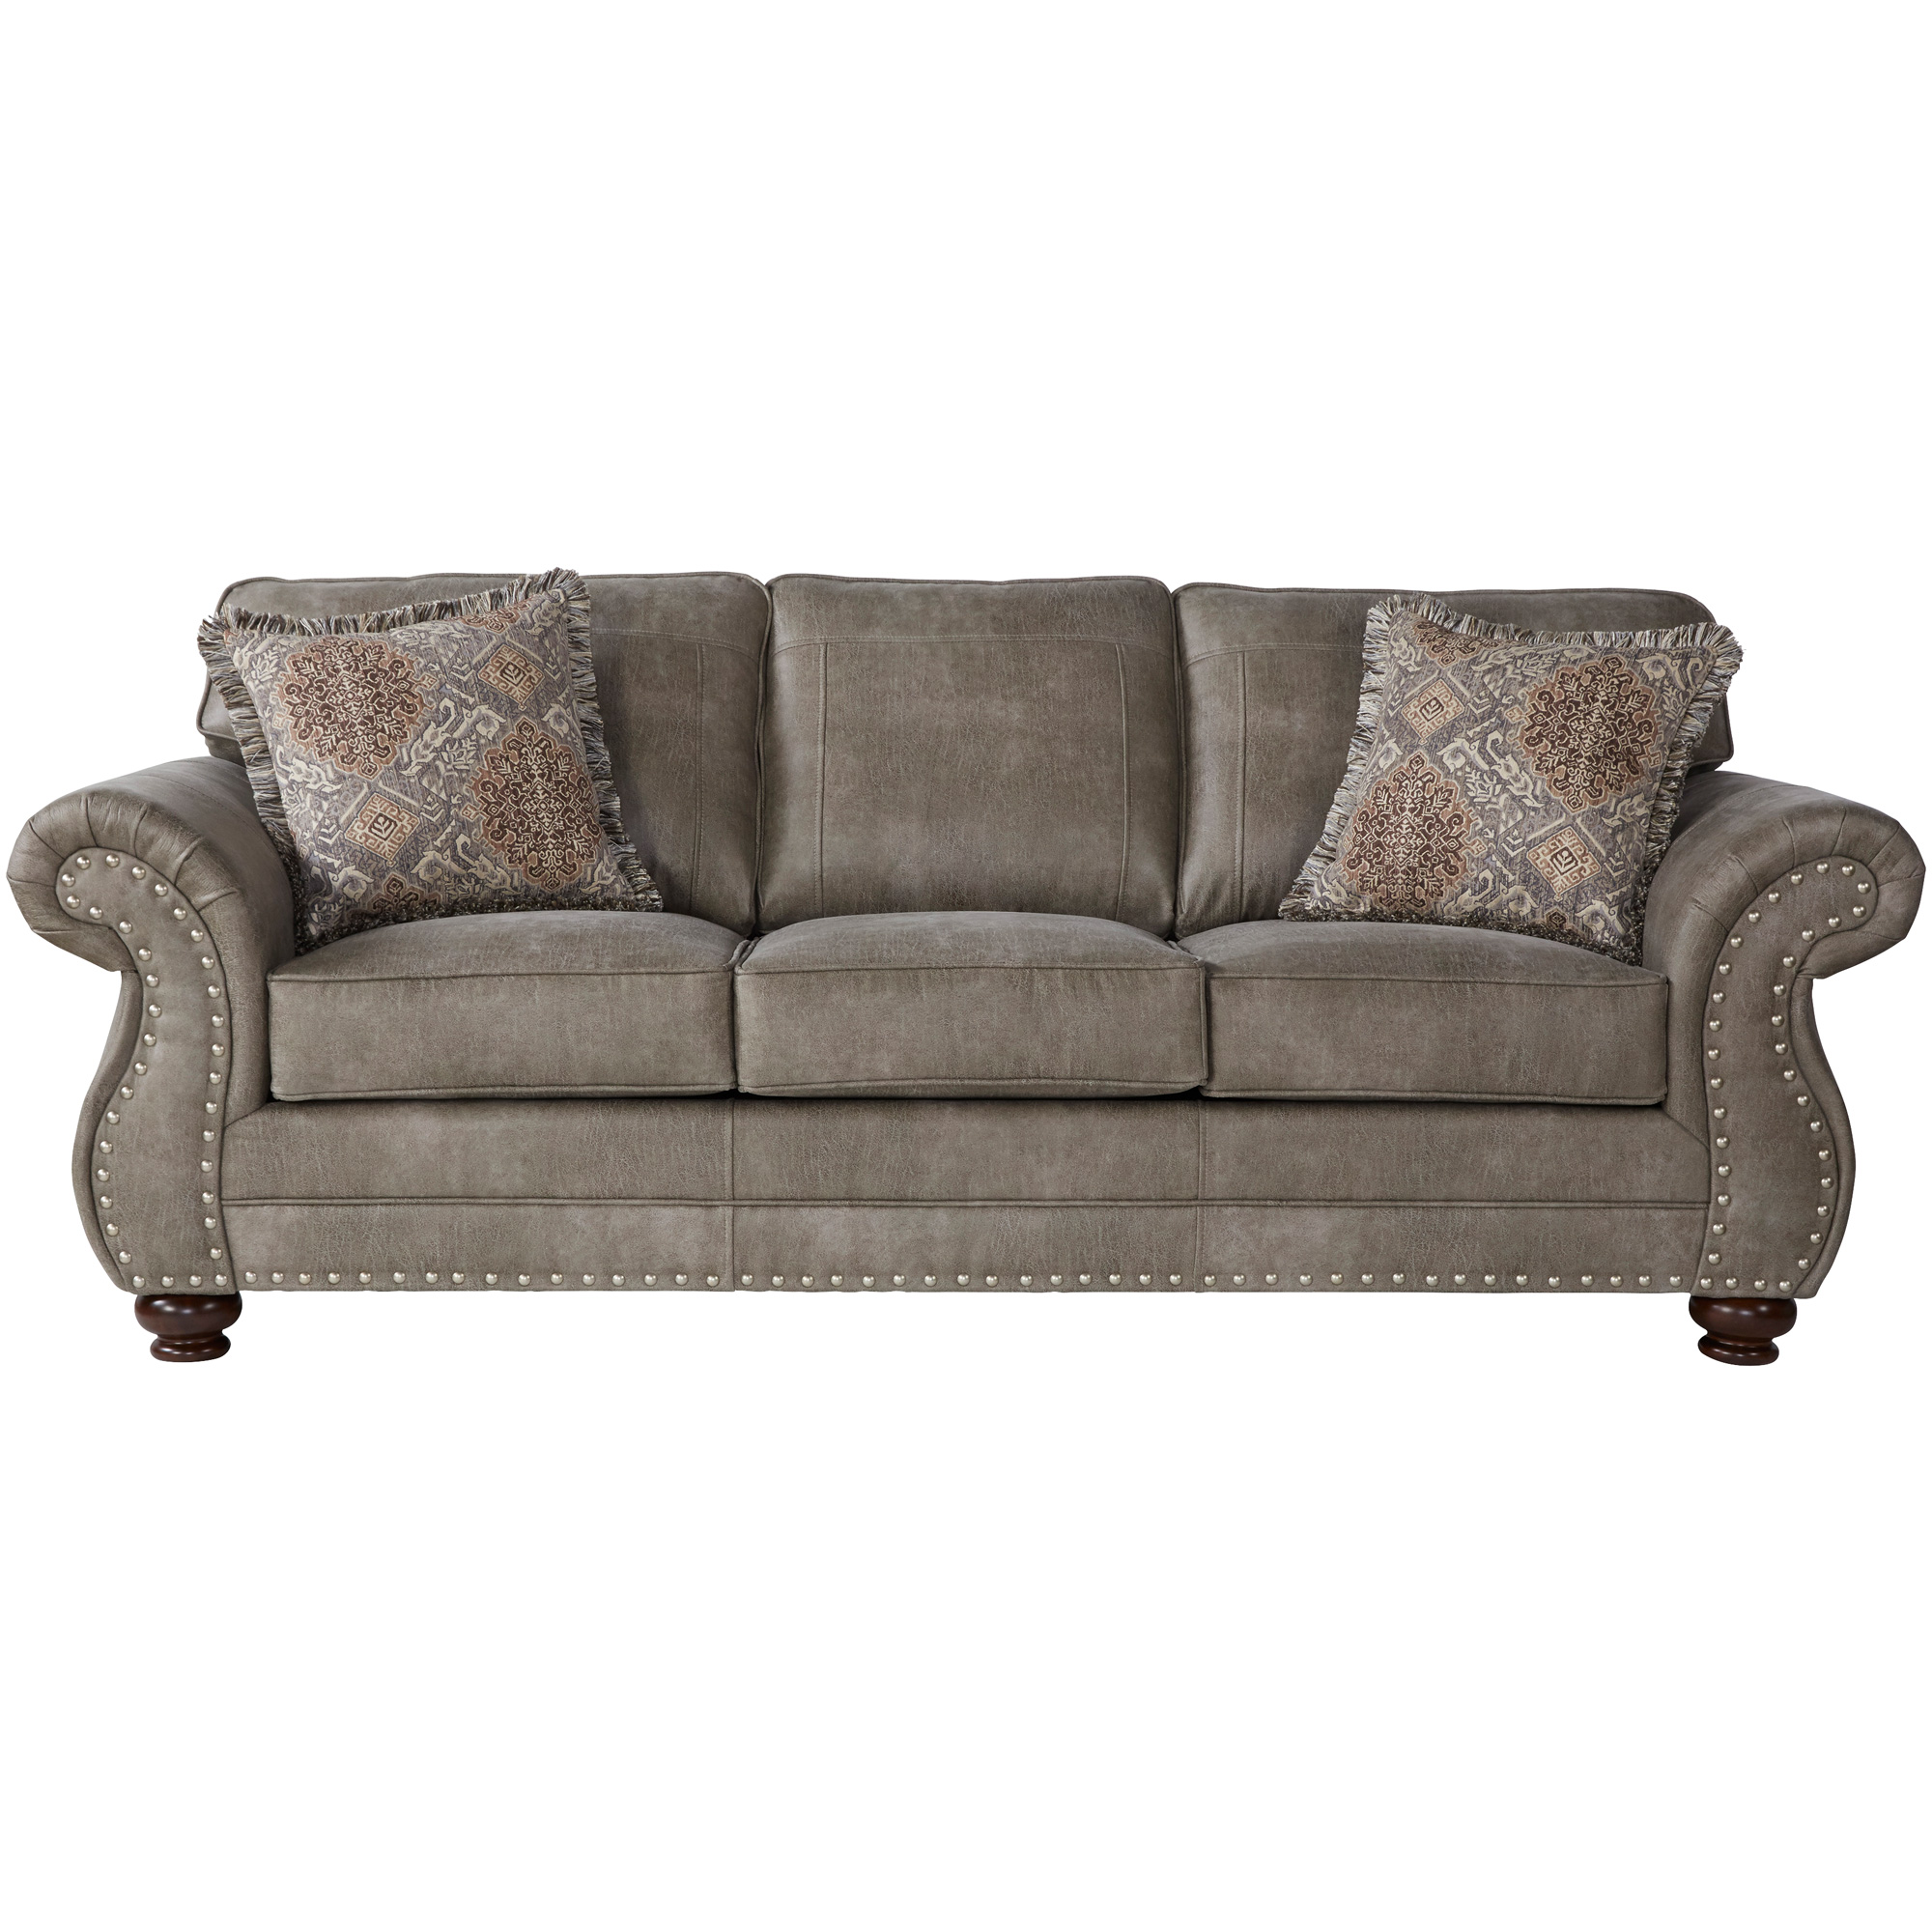 Serta Upholstery By Hughes Furniture | Bester Golitha Mica Sofa